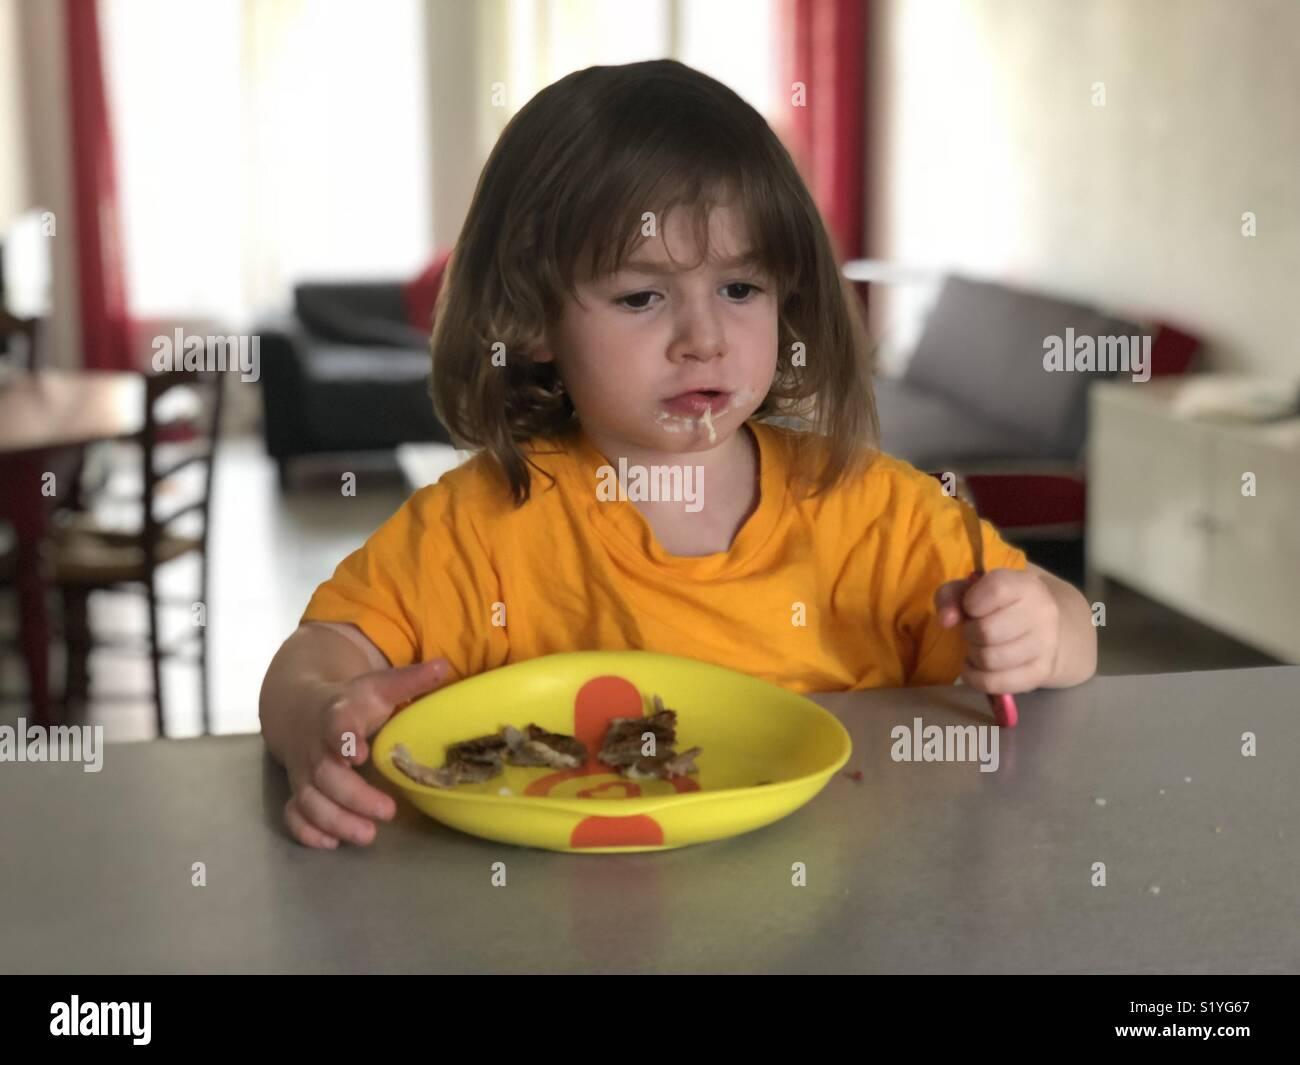 Infante comer en casa Imagen De Stock